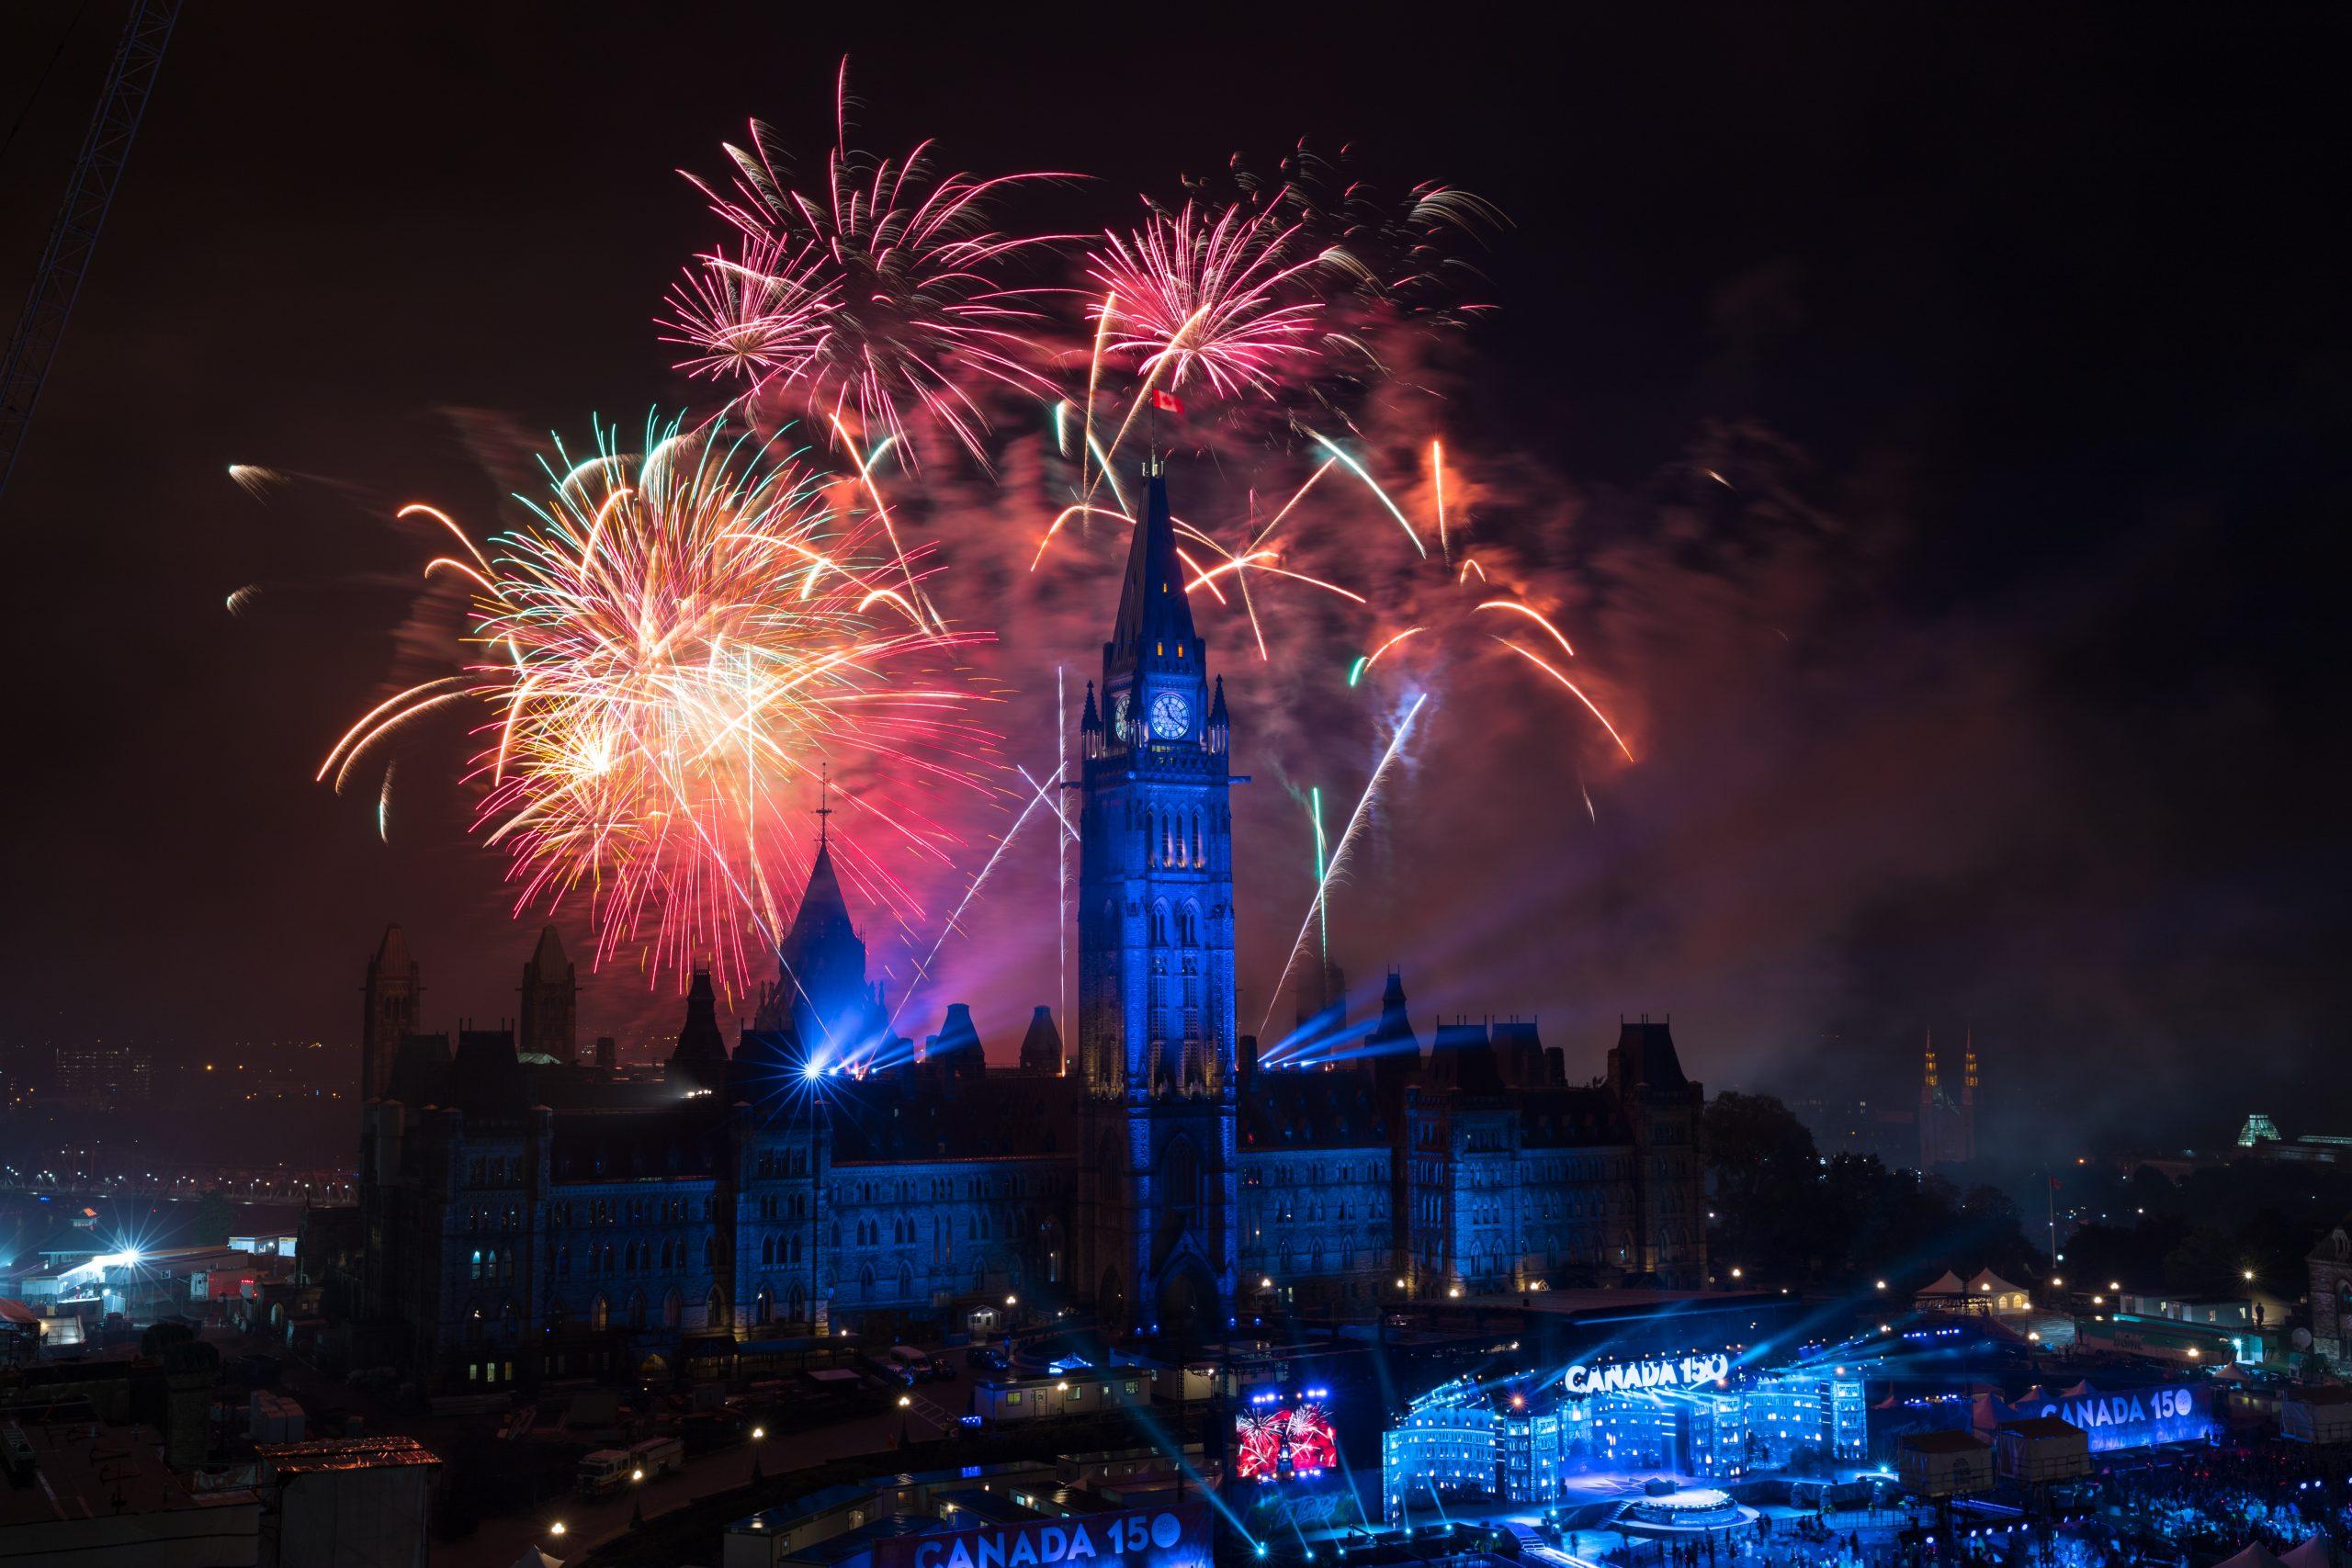 Canada-Day-Fireworks-Parliament-Hill-044A2772-credit-Ottawa-Tourism.jpg